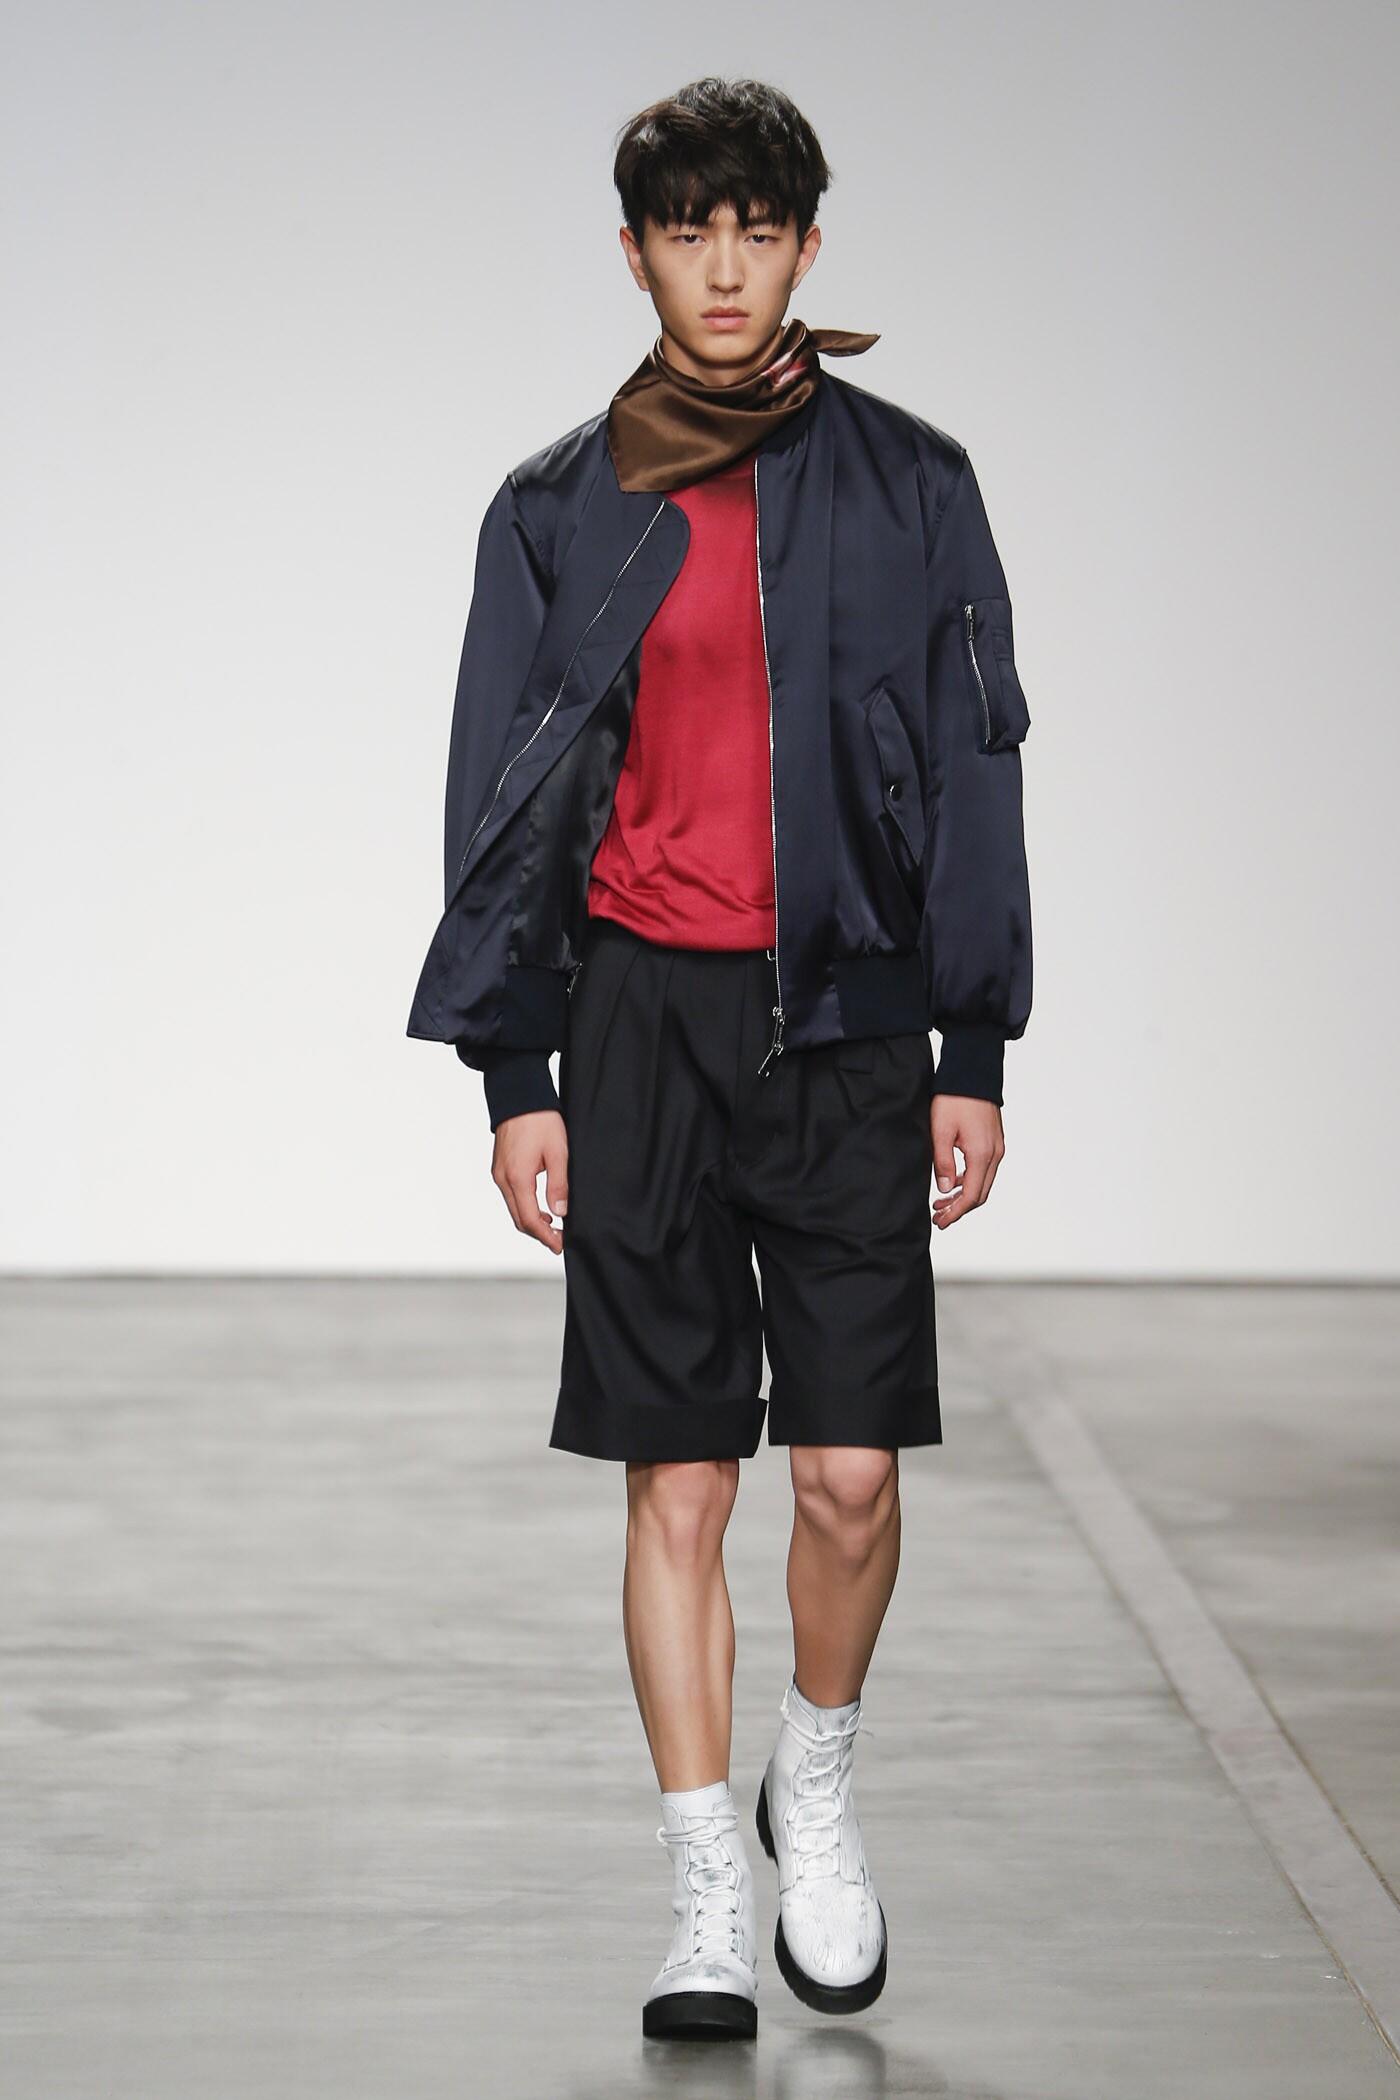 Iceberg Men's Collection 2015